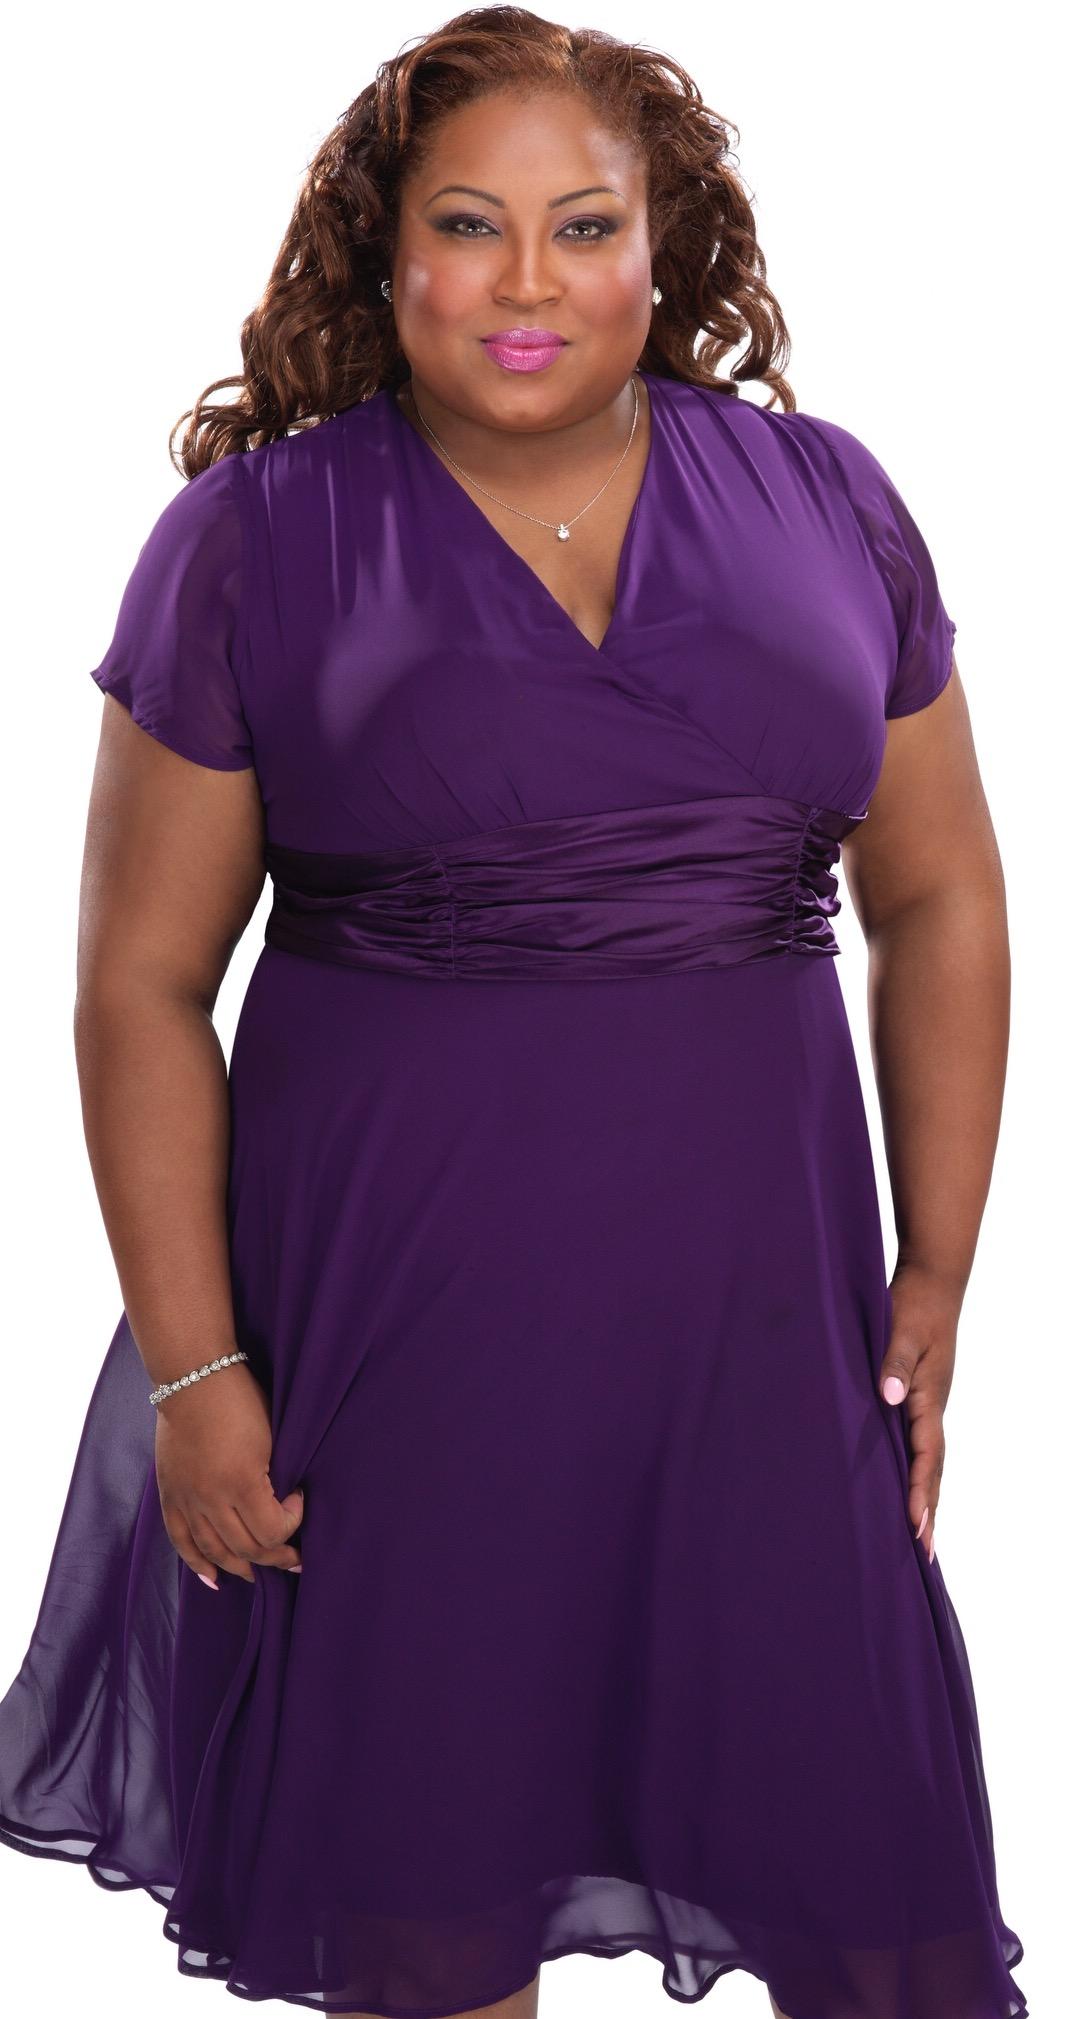 Tanisha Thomas | The Official Bad Girls Club Wiki | FANDOM powered ...